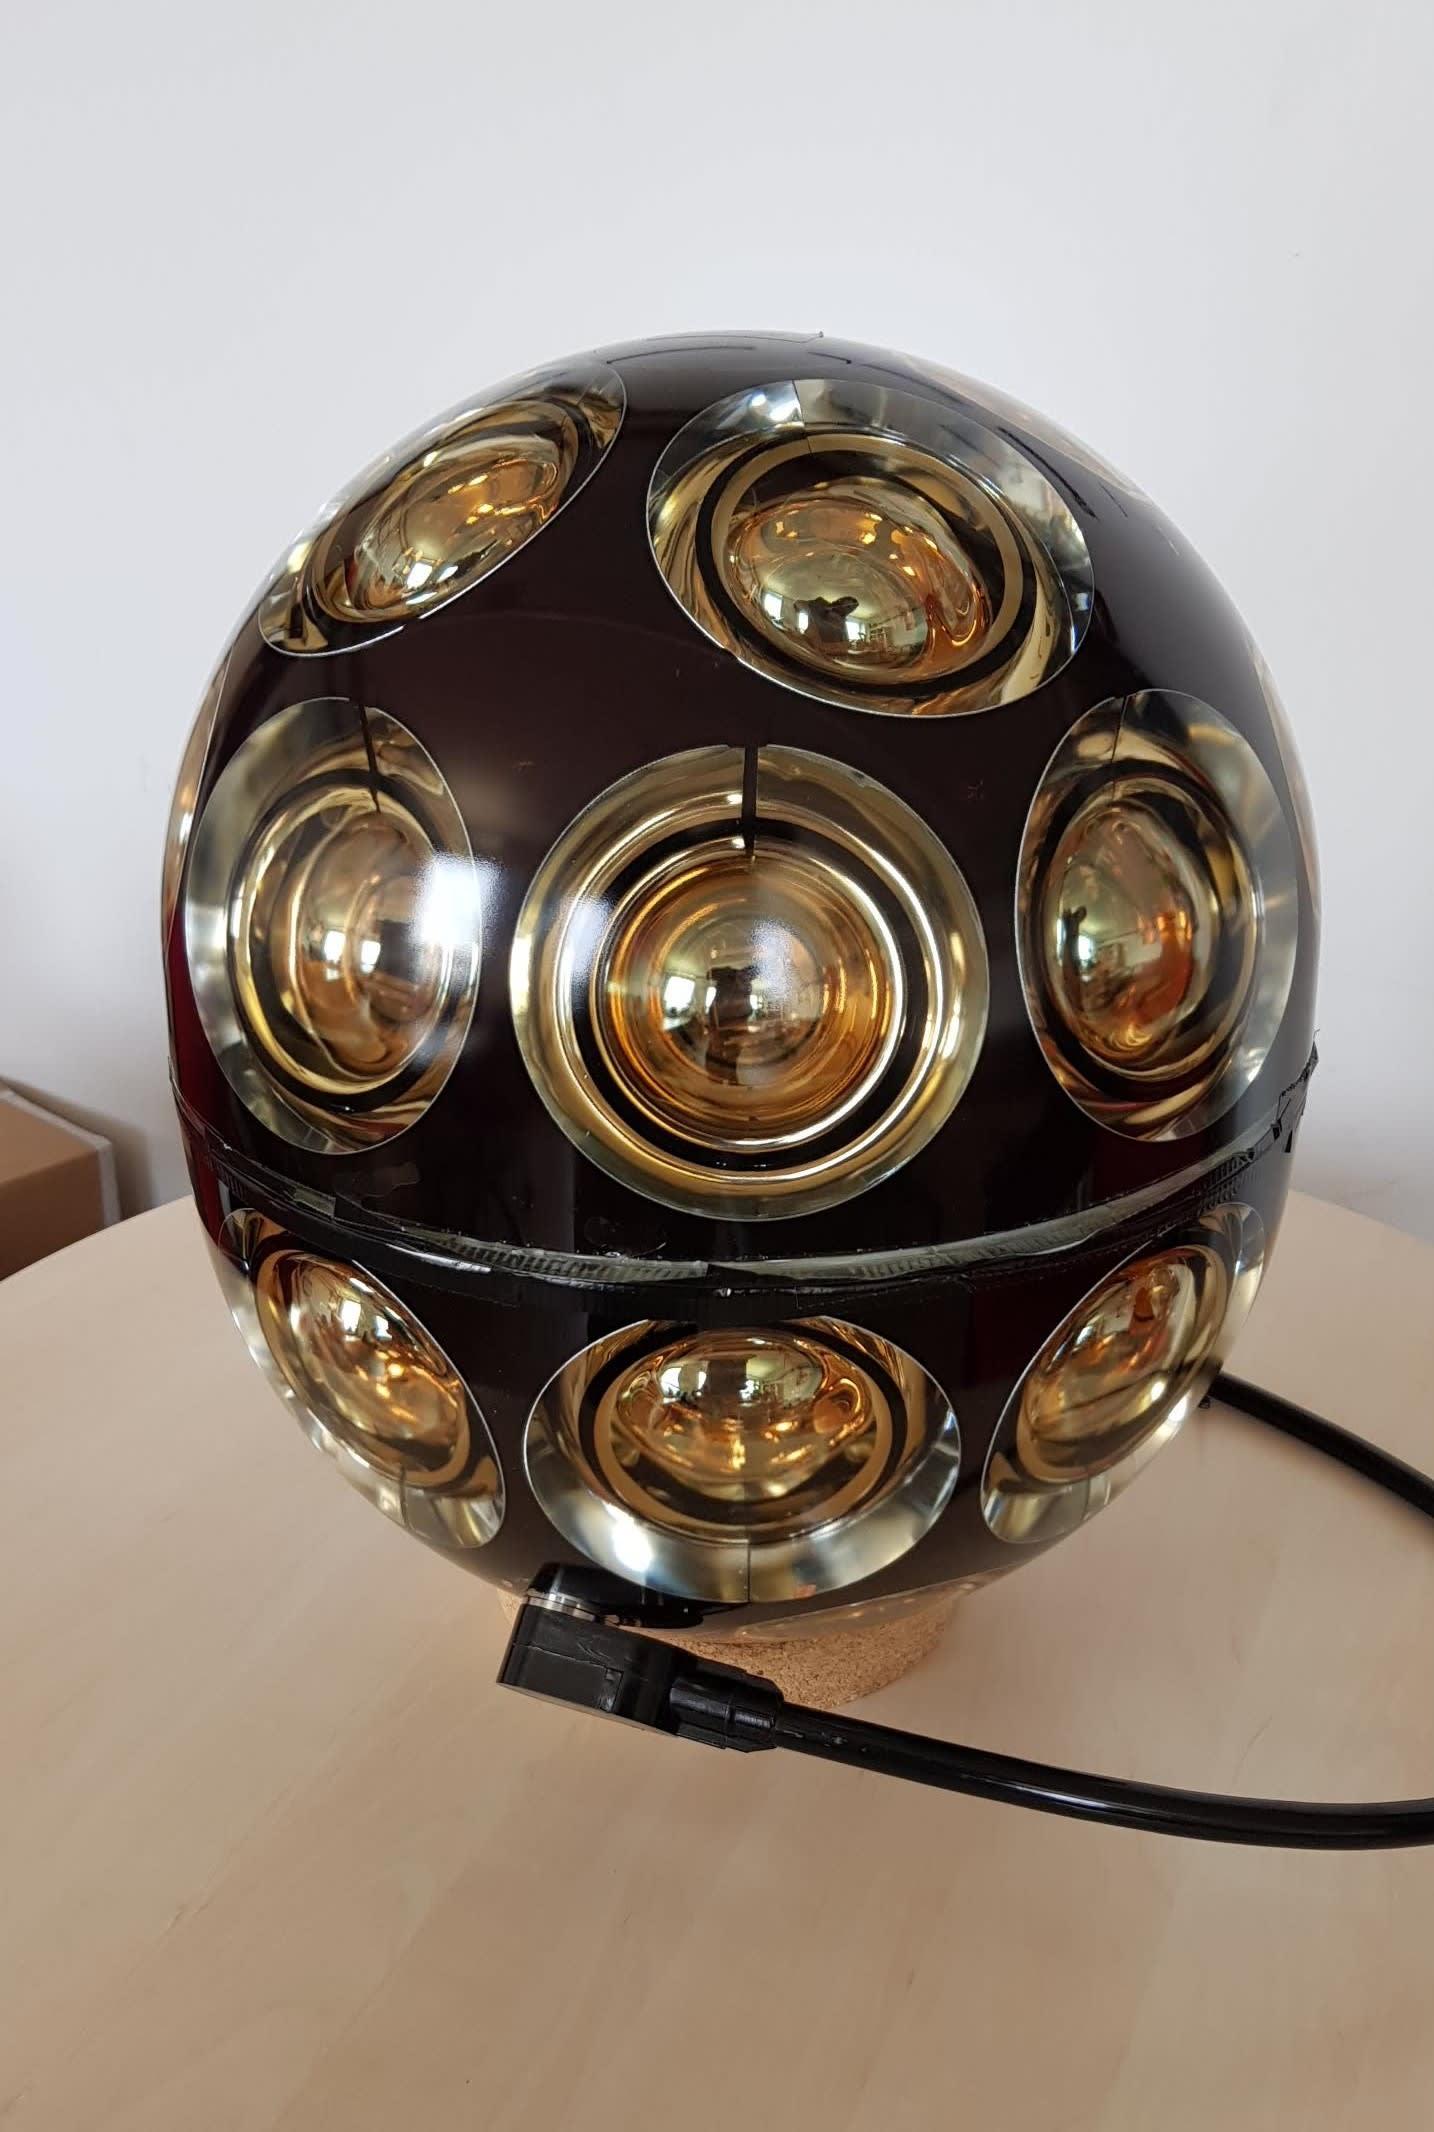 Prototype of an mDOM